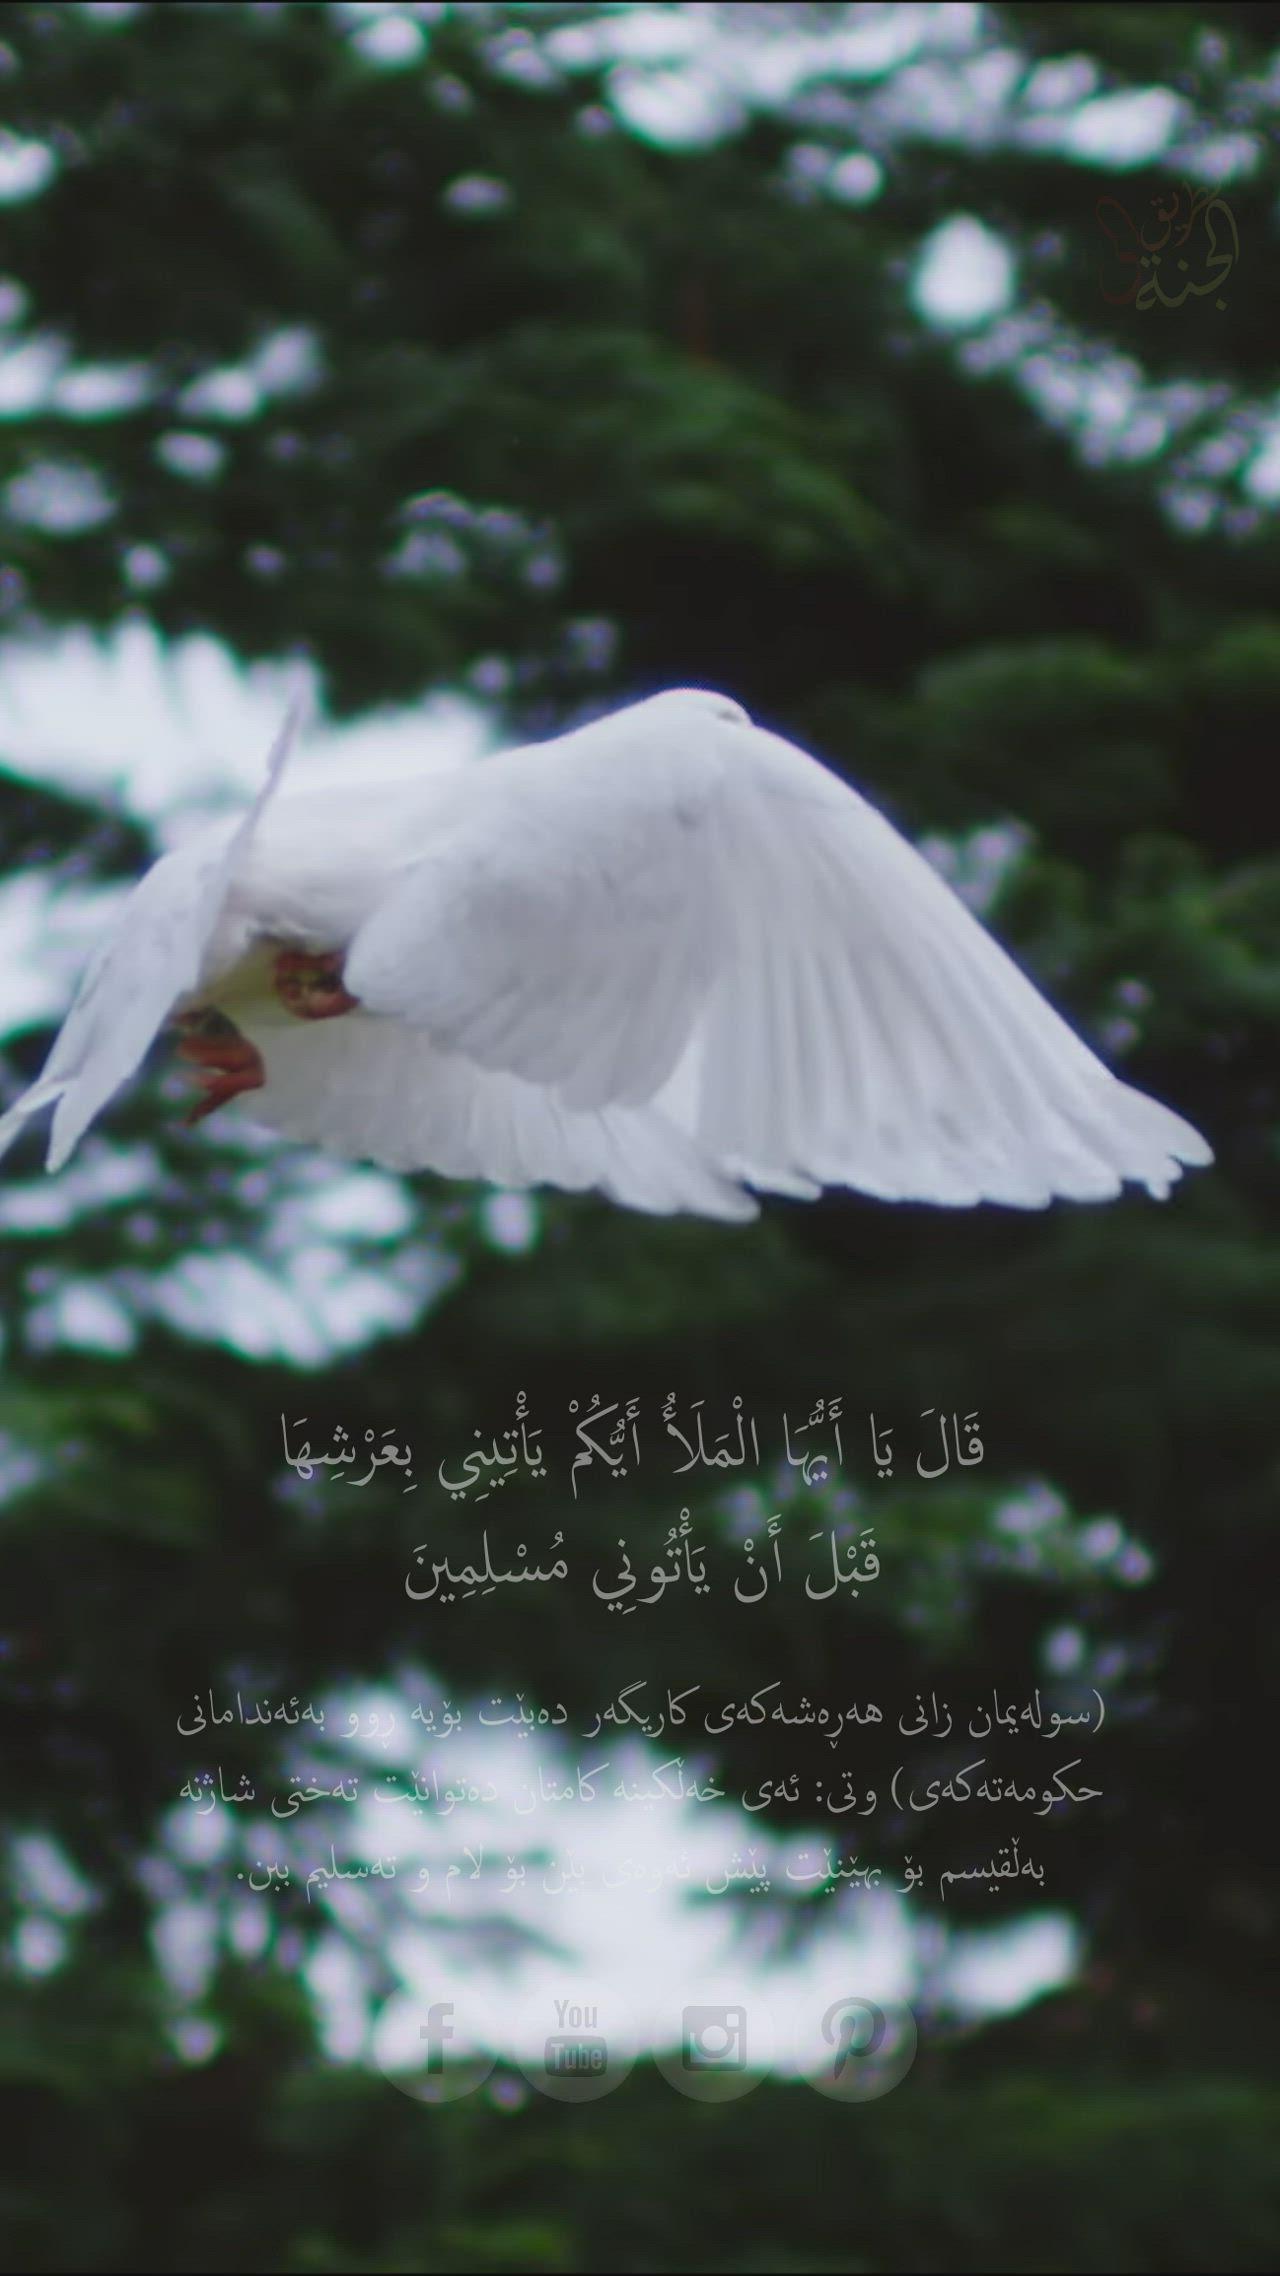 Islam Subhi Surah The Ant Video In 2021 Beautiful Quran Verses Quran Recitation Beautiful Quran Quotes